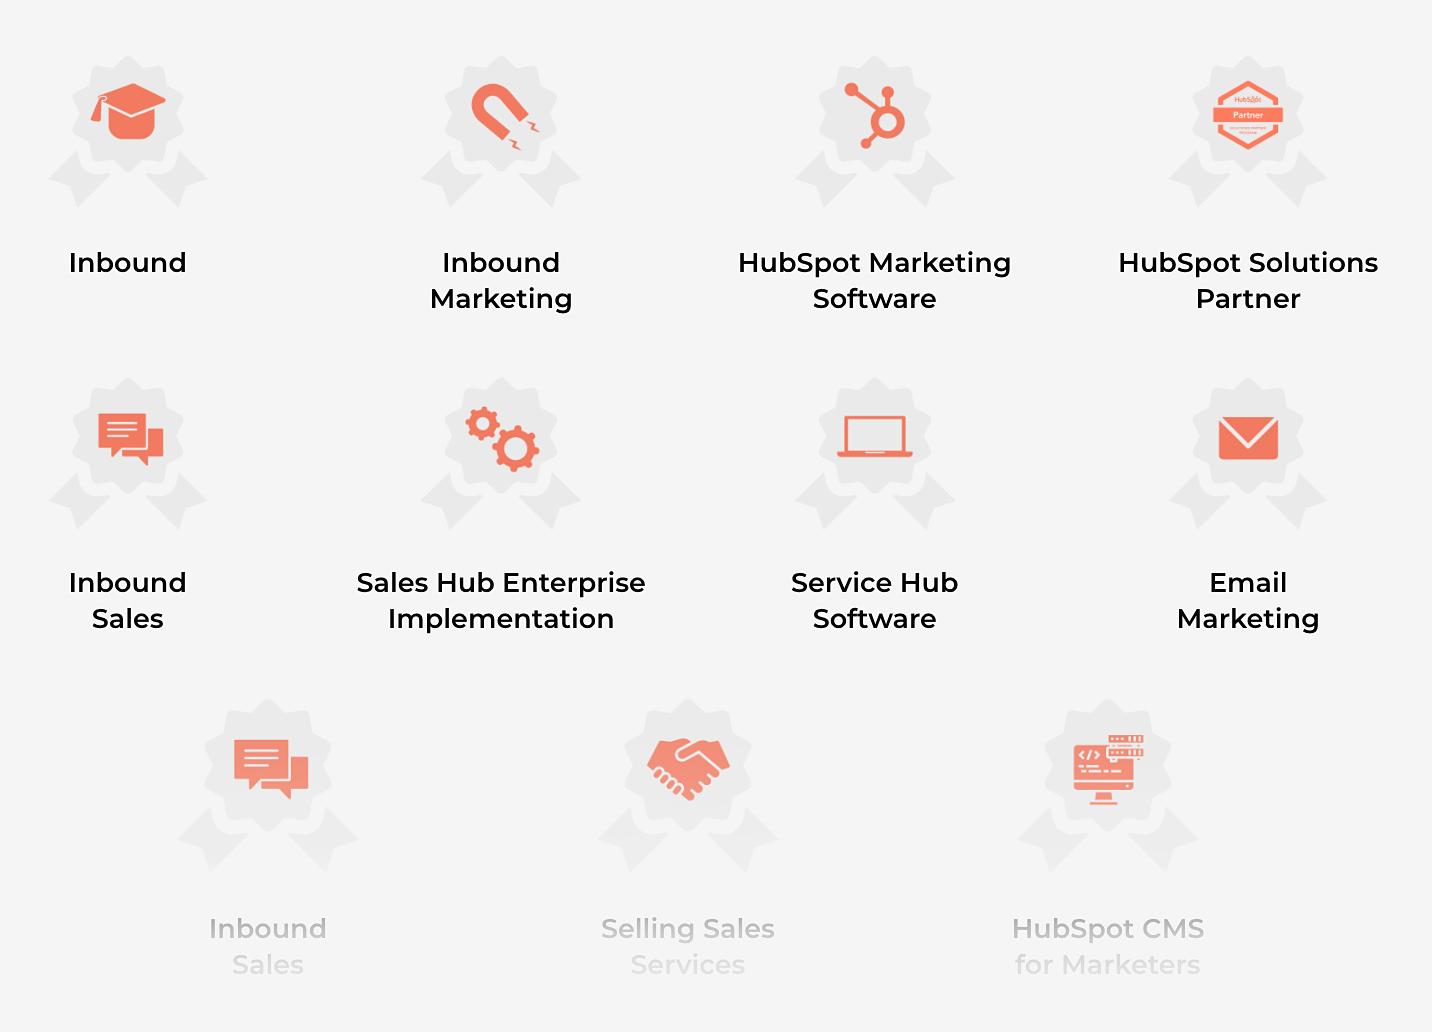 Wiedza poparta certyfikatami HubSpot